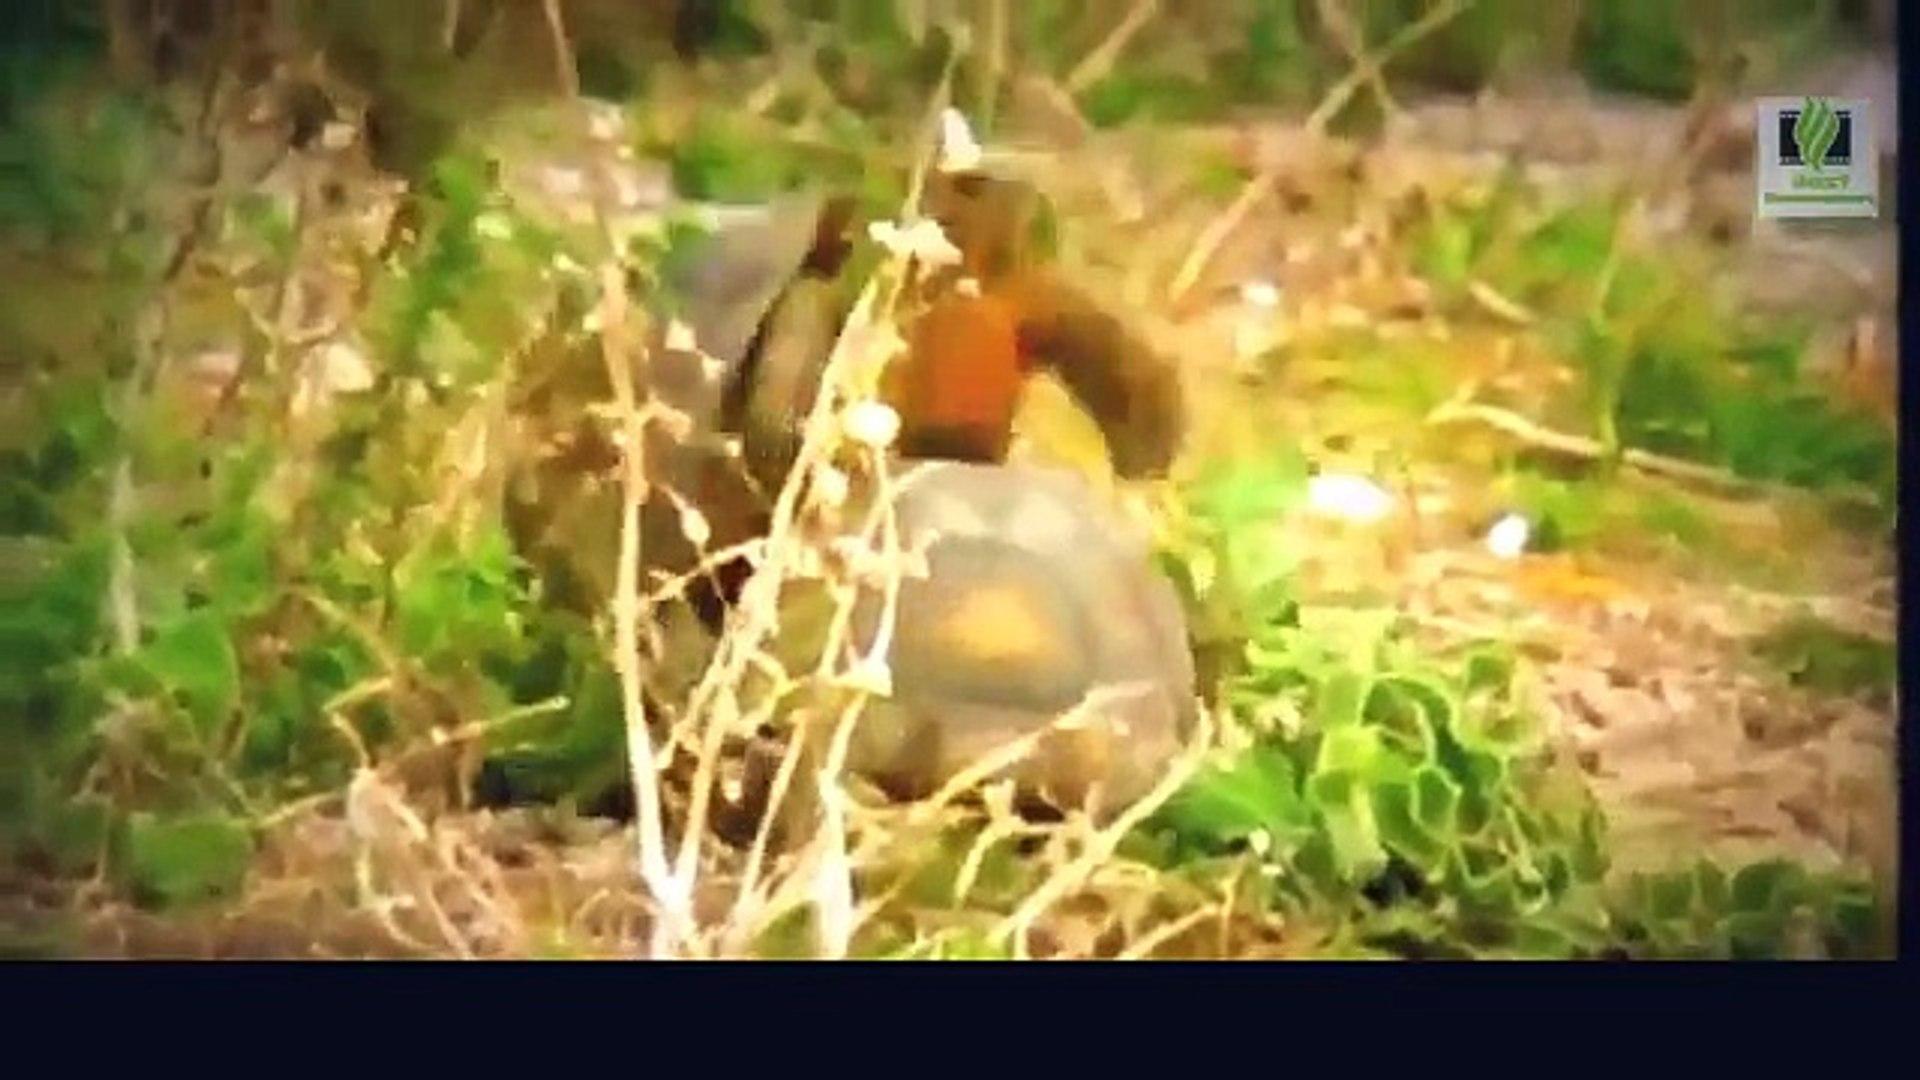 Snake Documentary Snake Documentary Amazing Life of Turtles and Tortoises - Nature Documentary Fil